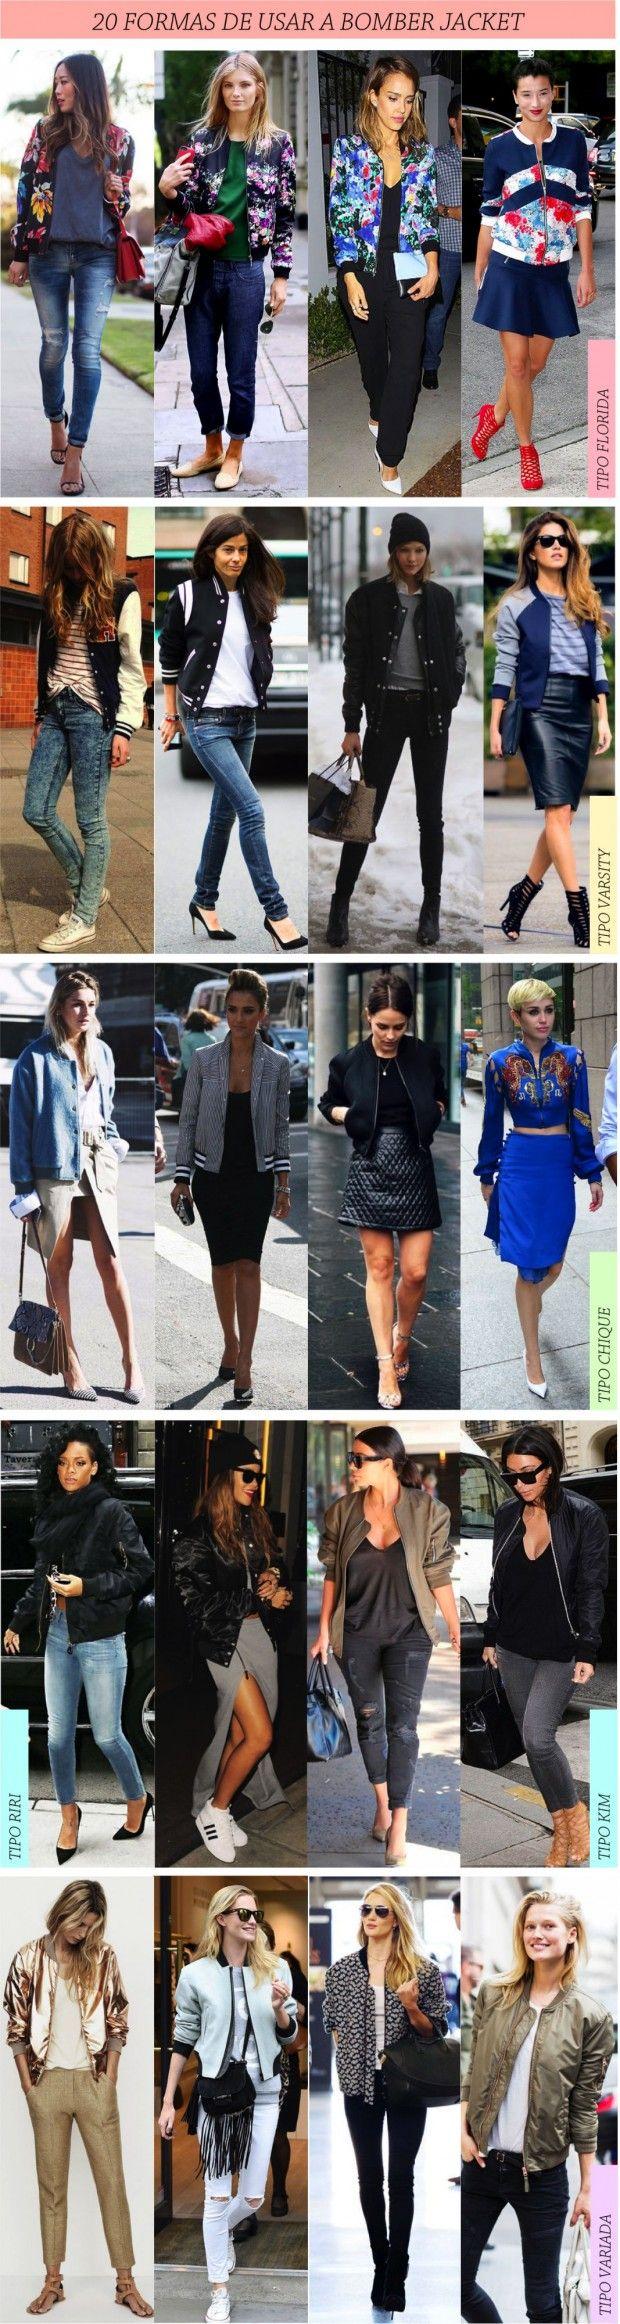 27 FORMAS DE USAR JAQUETA TIPO BOMBER - Fashionismo